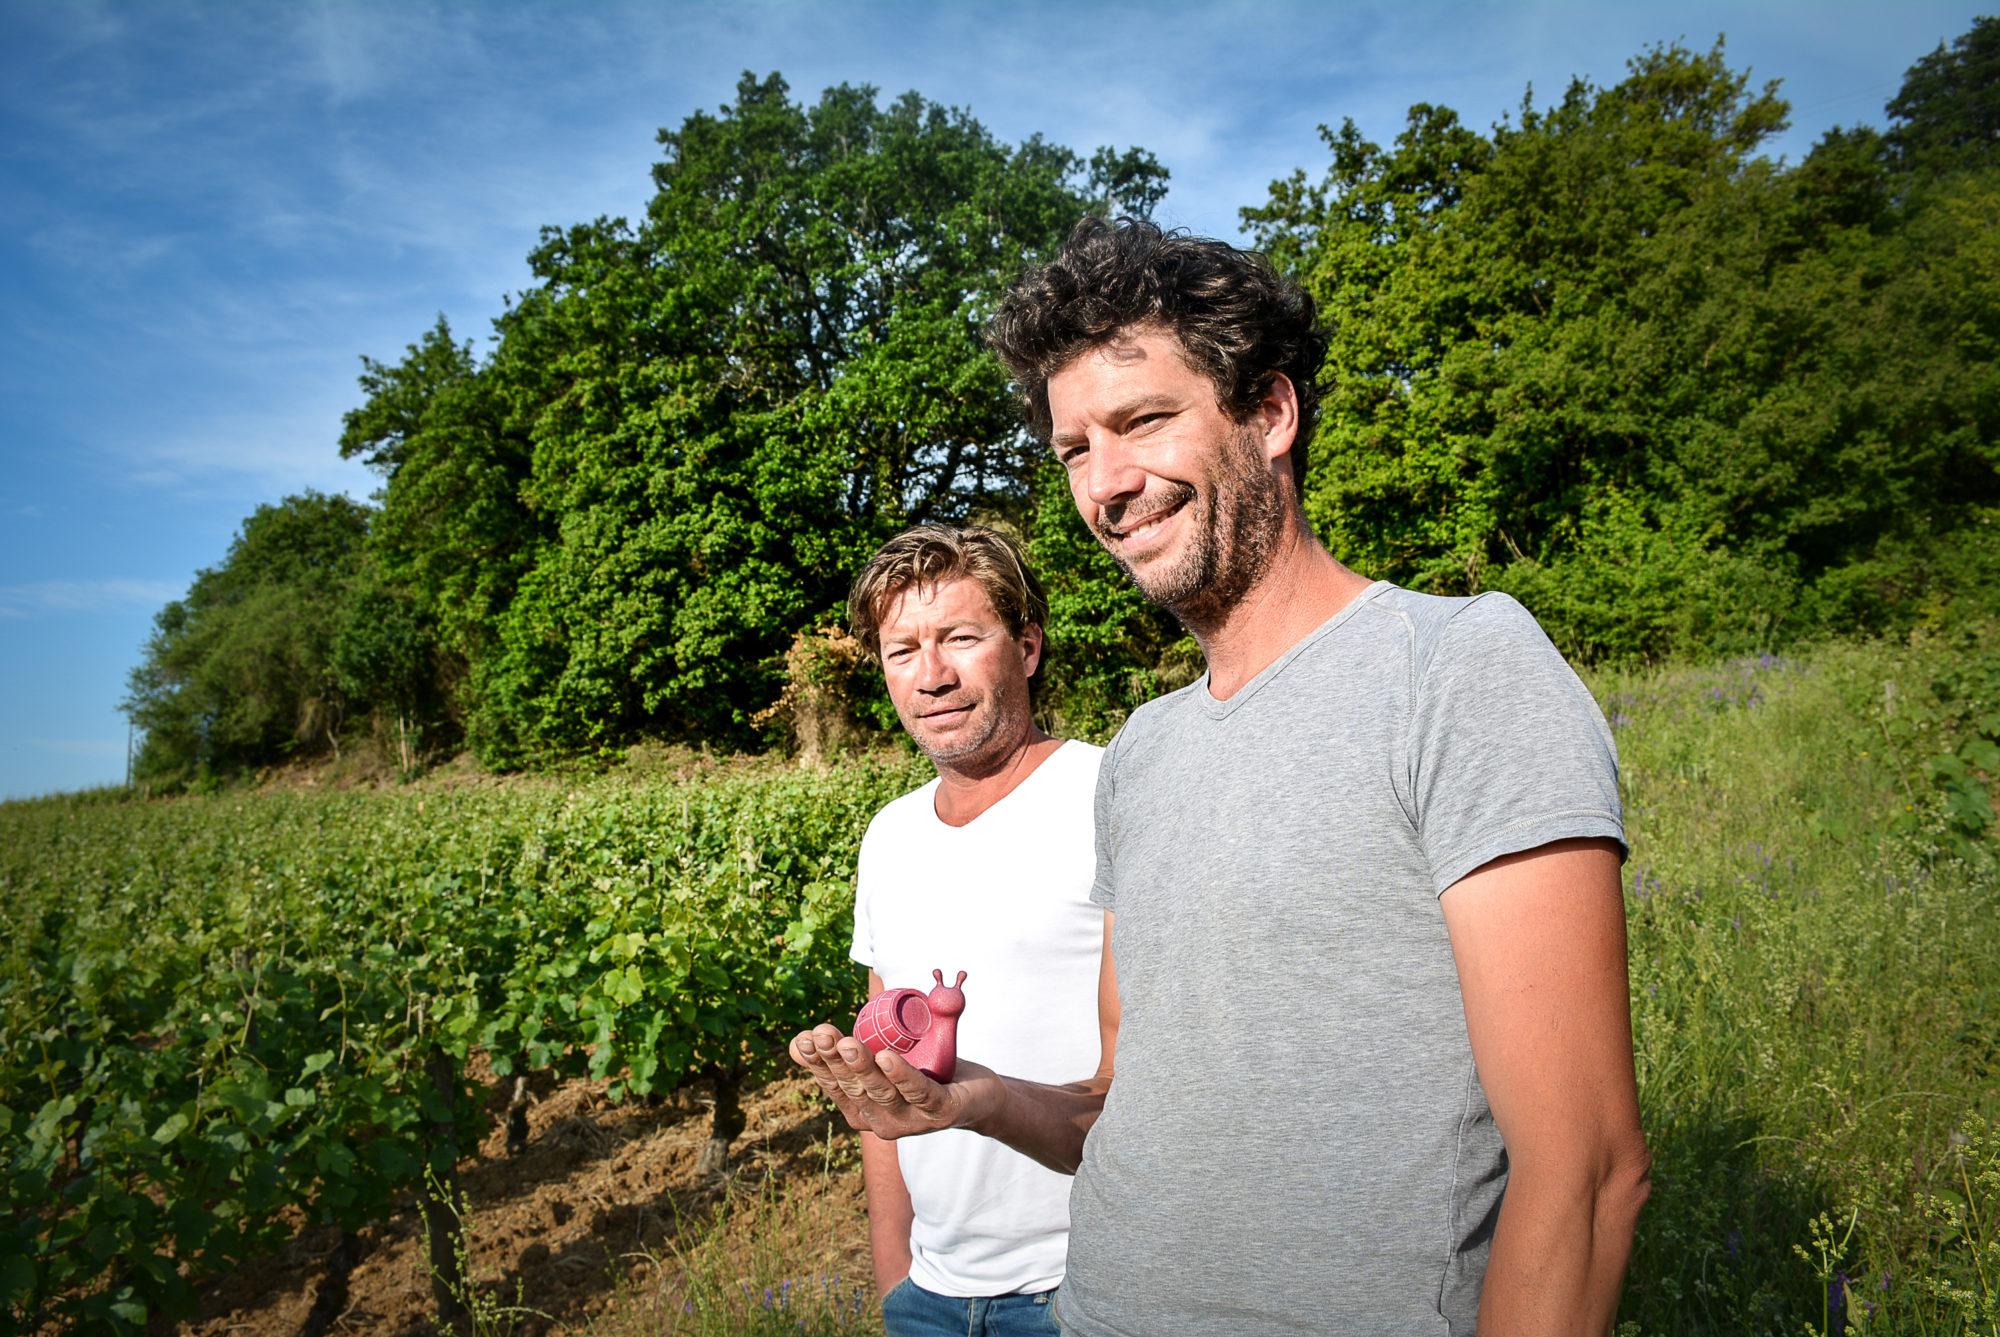 Lenaïc & Samuel Legros